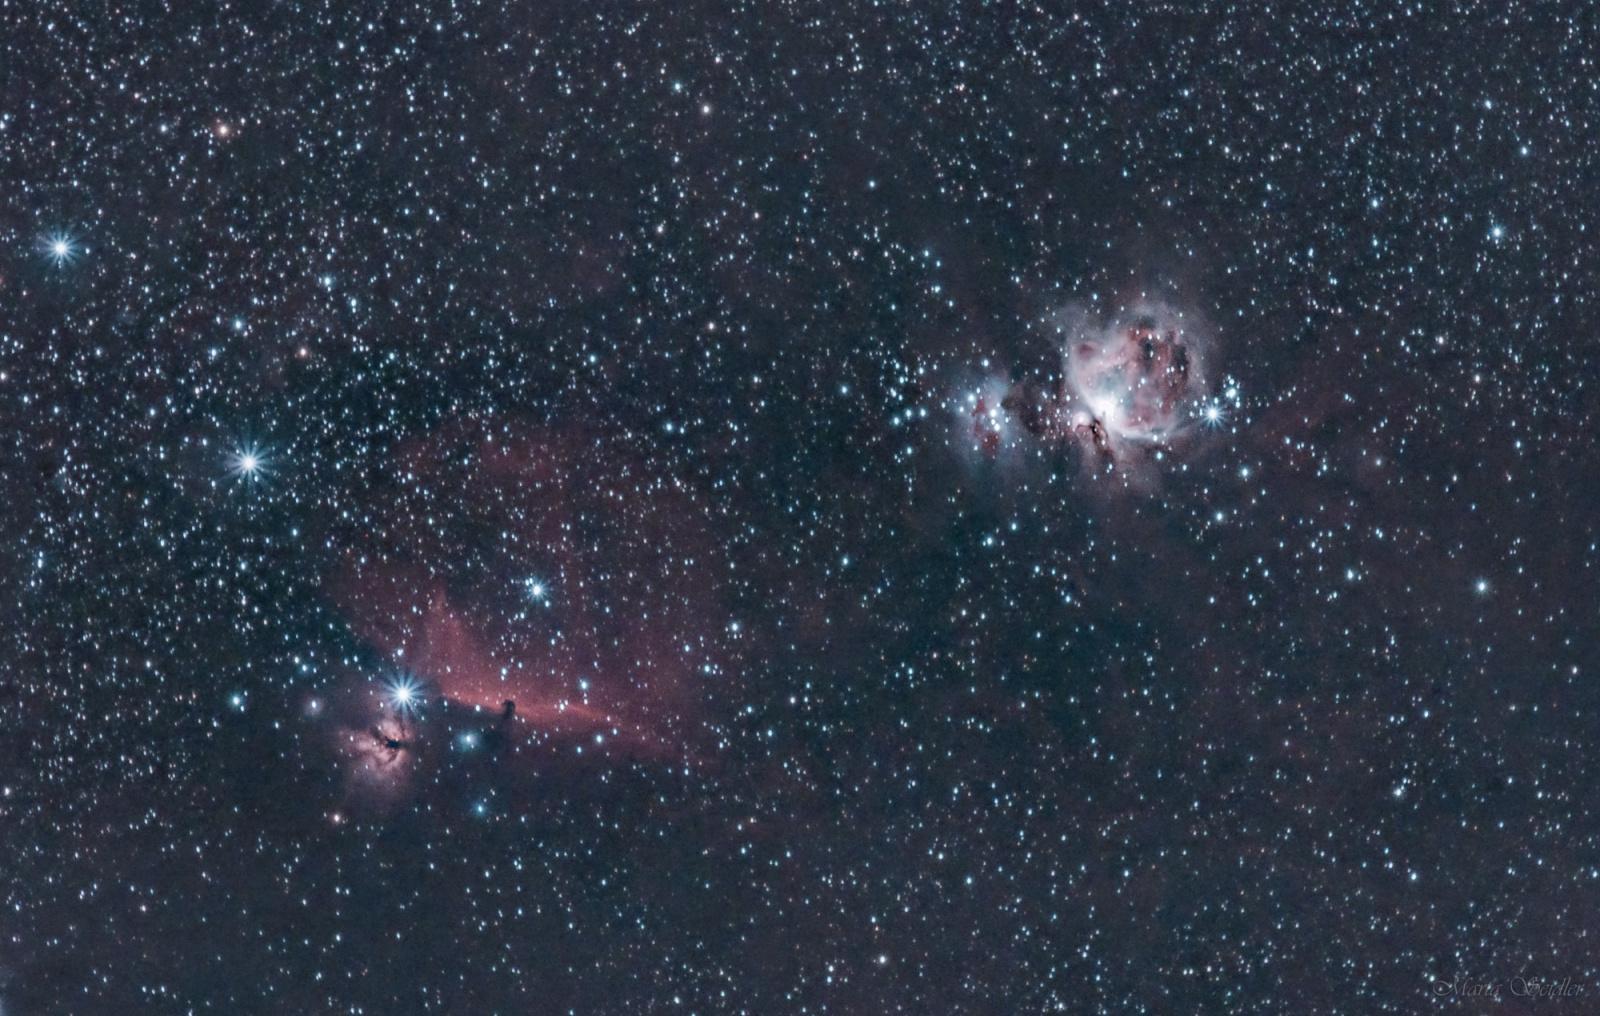 Orion.thumb.jpg.56f9430d107893cd8c57dba7a05e11d1.jpg